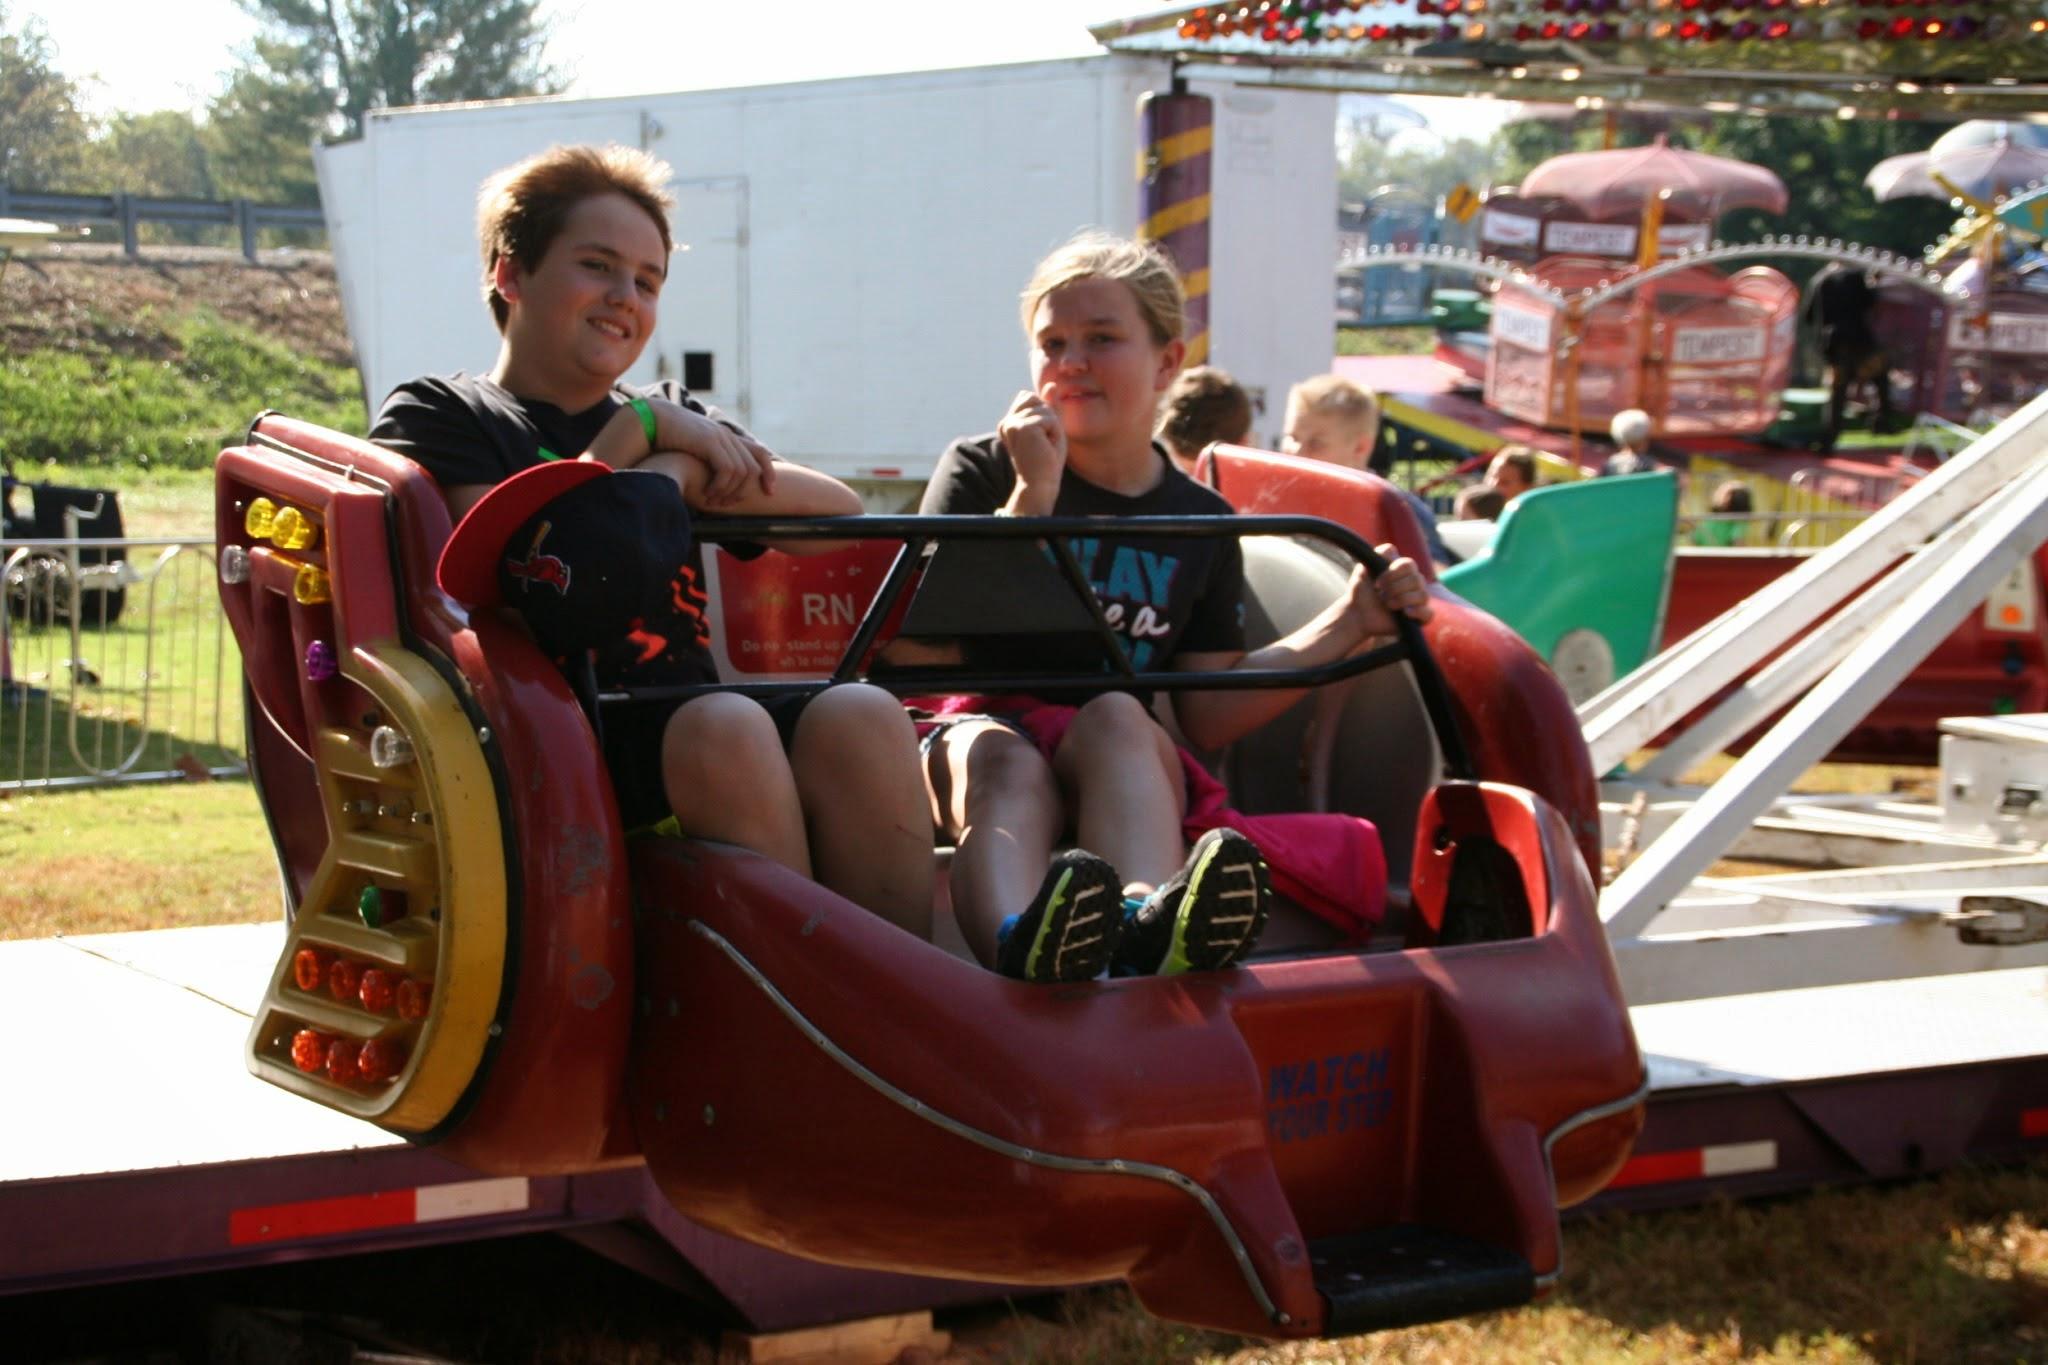 carnival-rides-3